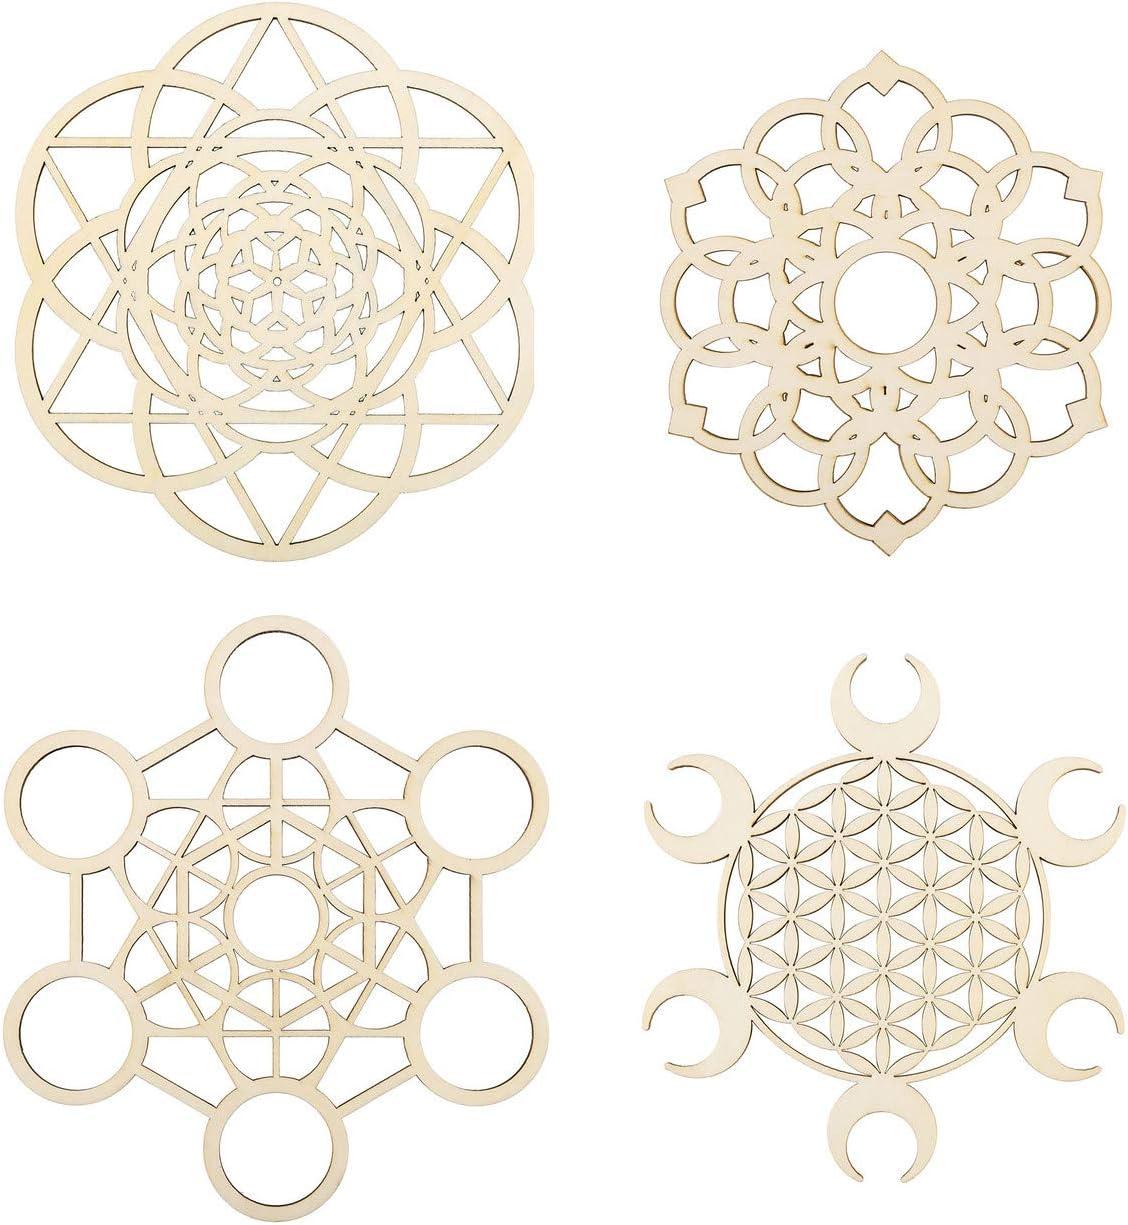 Kitmose 4pcs Sacred Geometry Crystal Grids Flower of Life Set Wooden Wall Decor Art Yoga Meditation Spiritual Crystal Decor Symbol Hanging Home Decoration